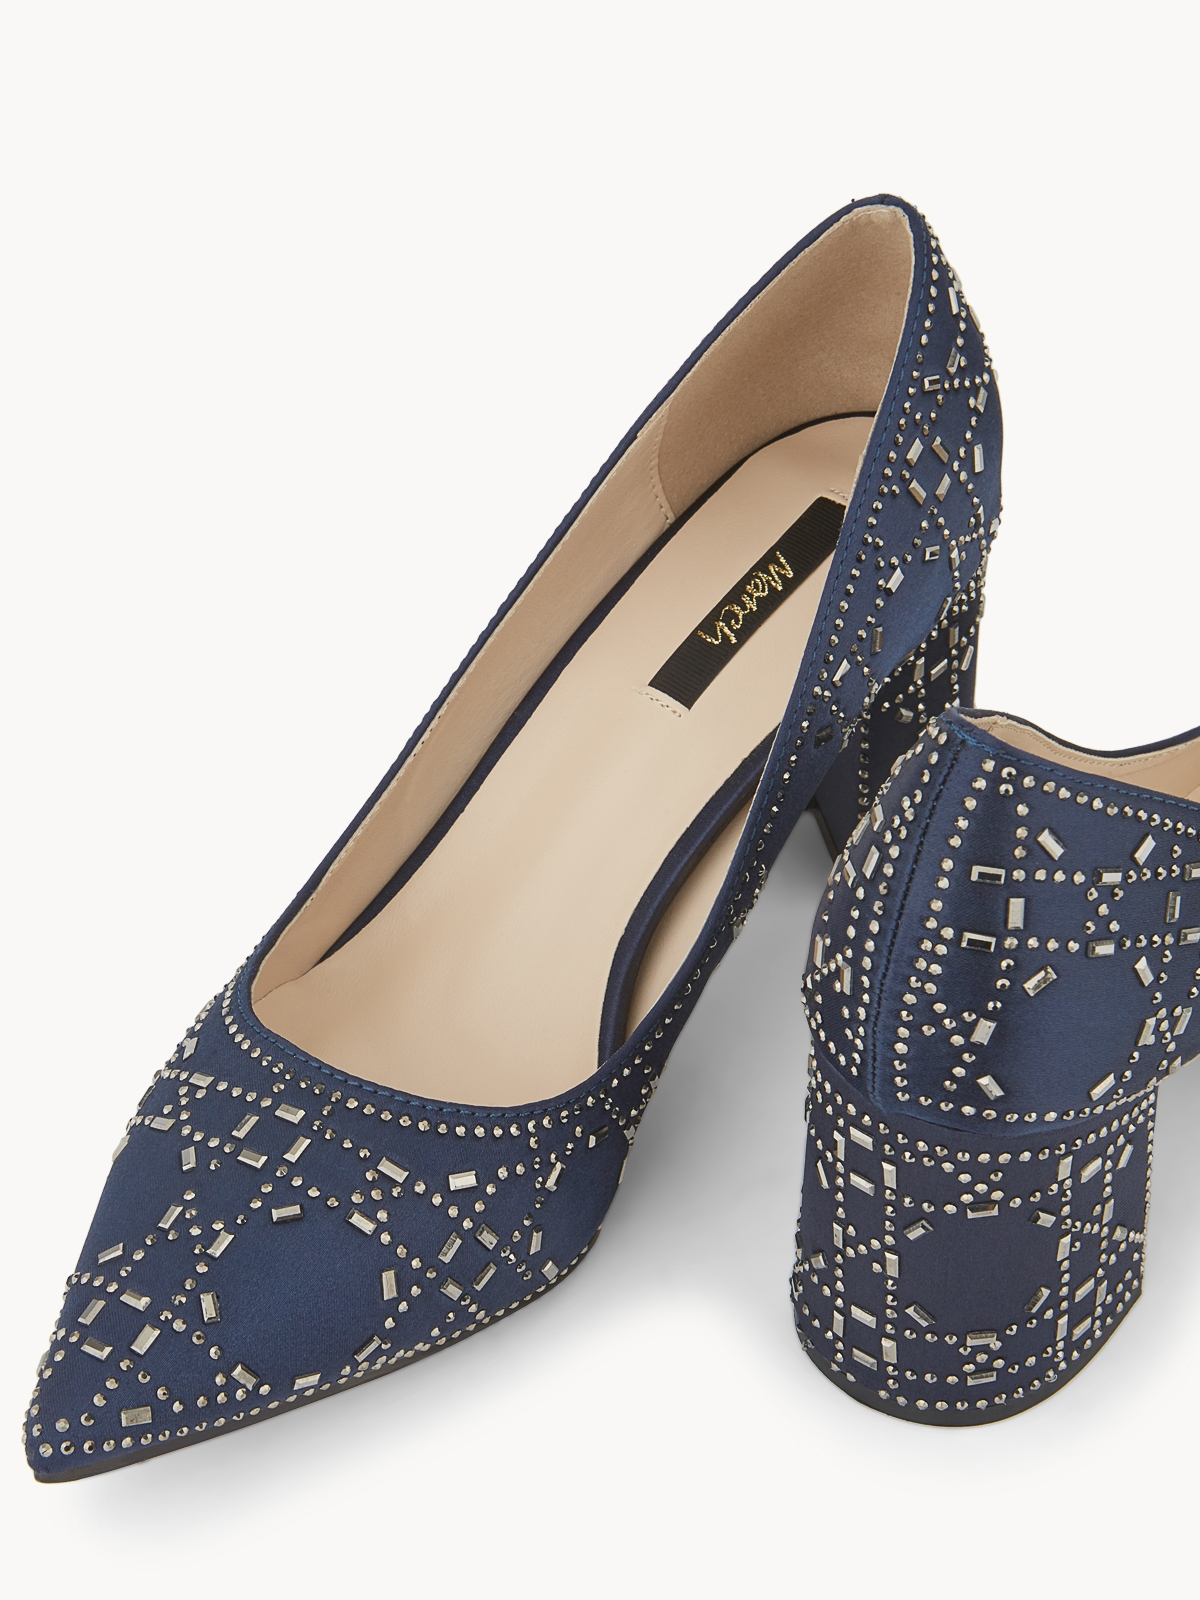 March Shoes Kathy Textured Block Heels Navy